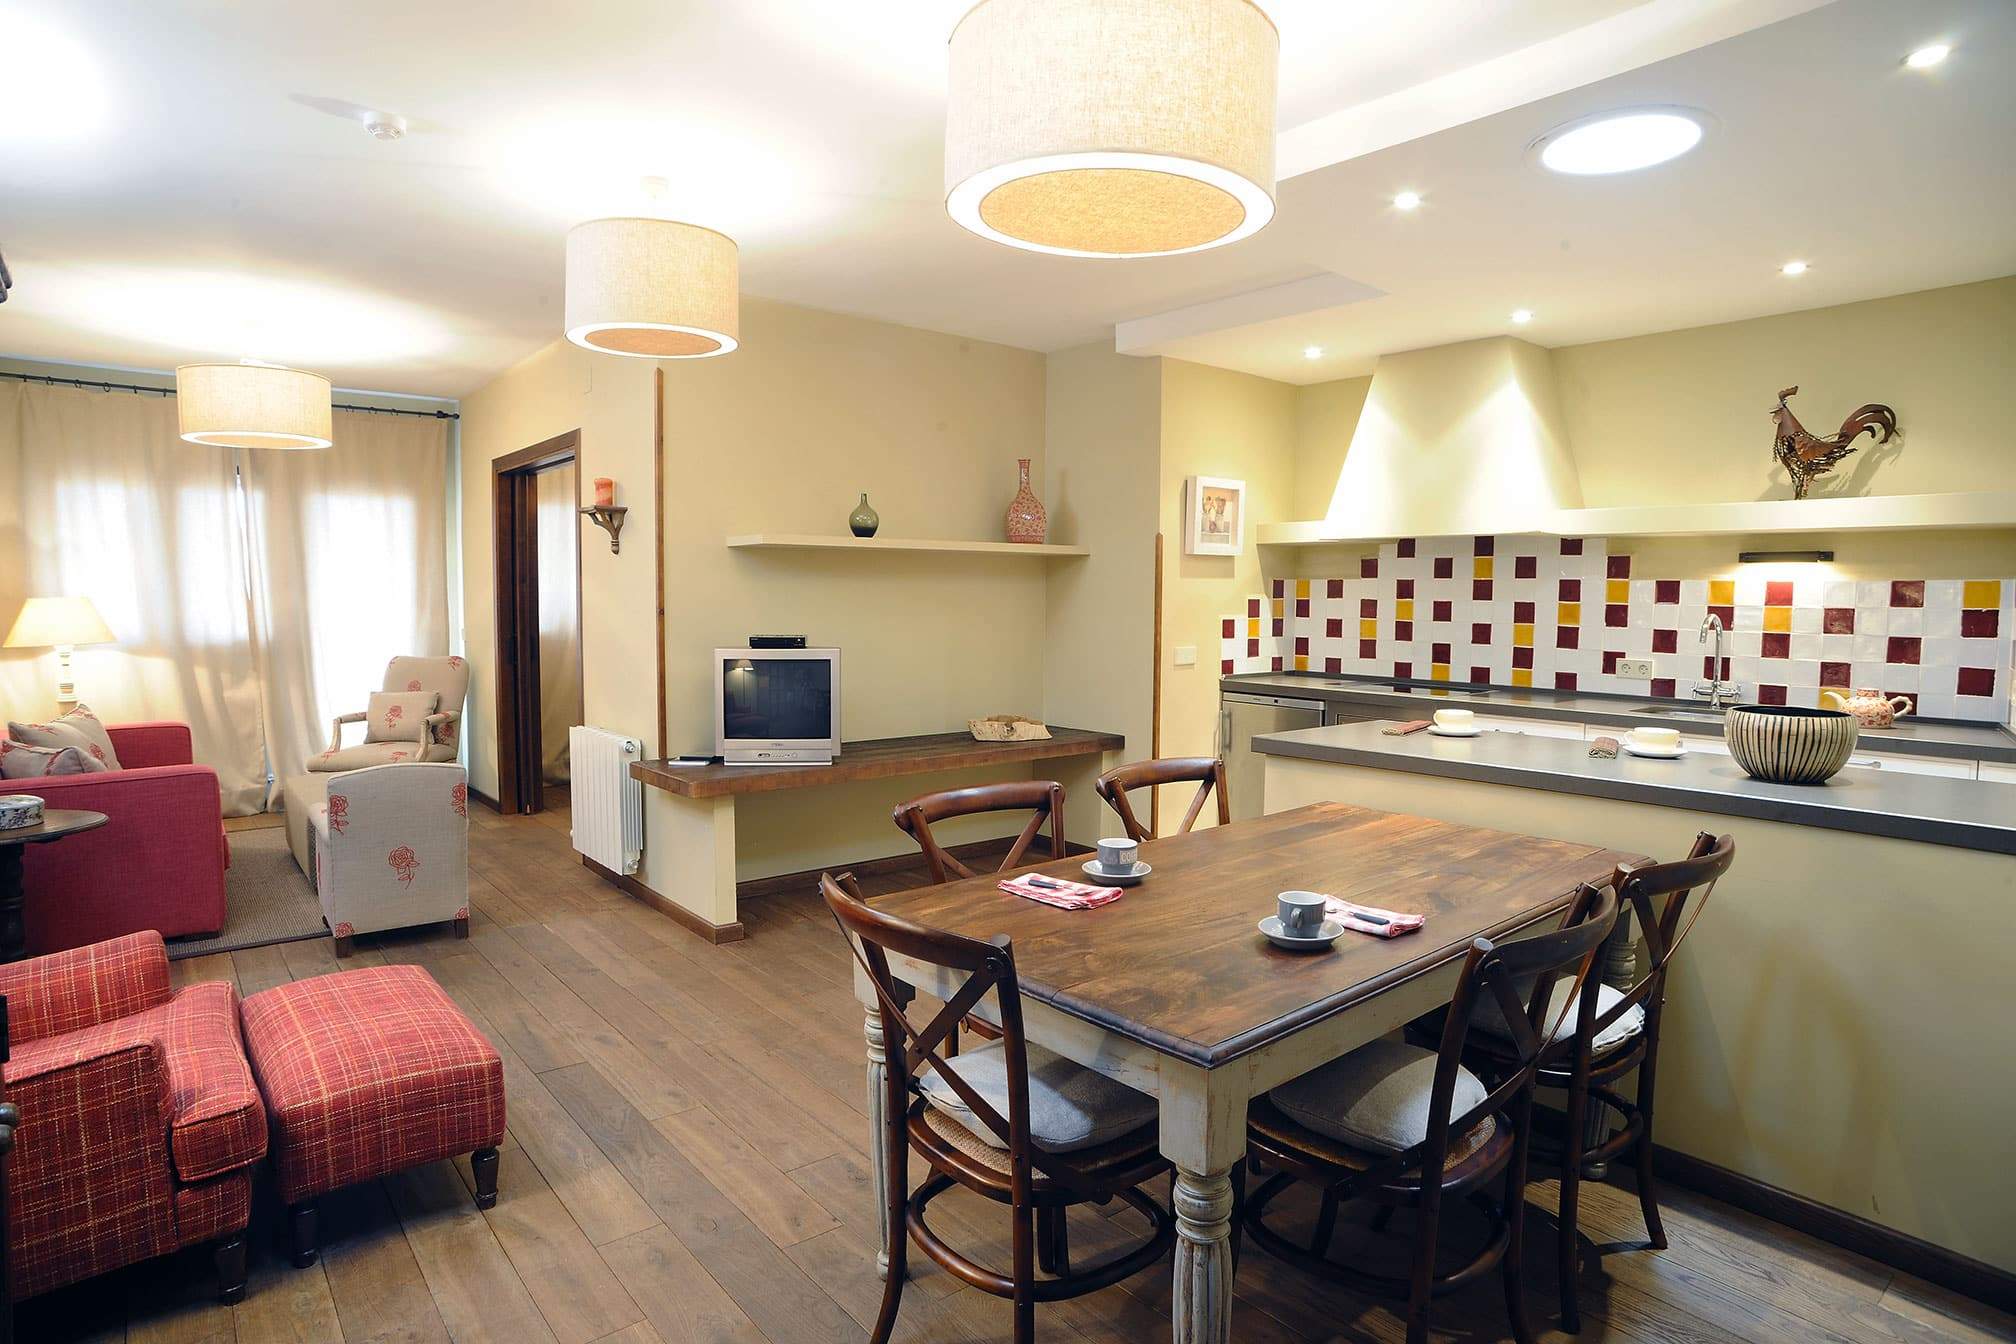 Apartamento Rural en Segovia - La Terrera